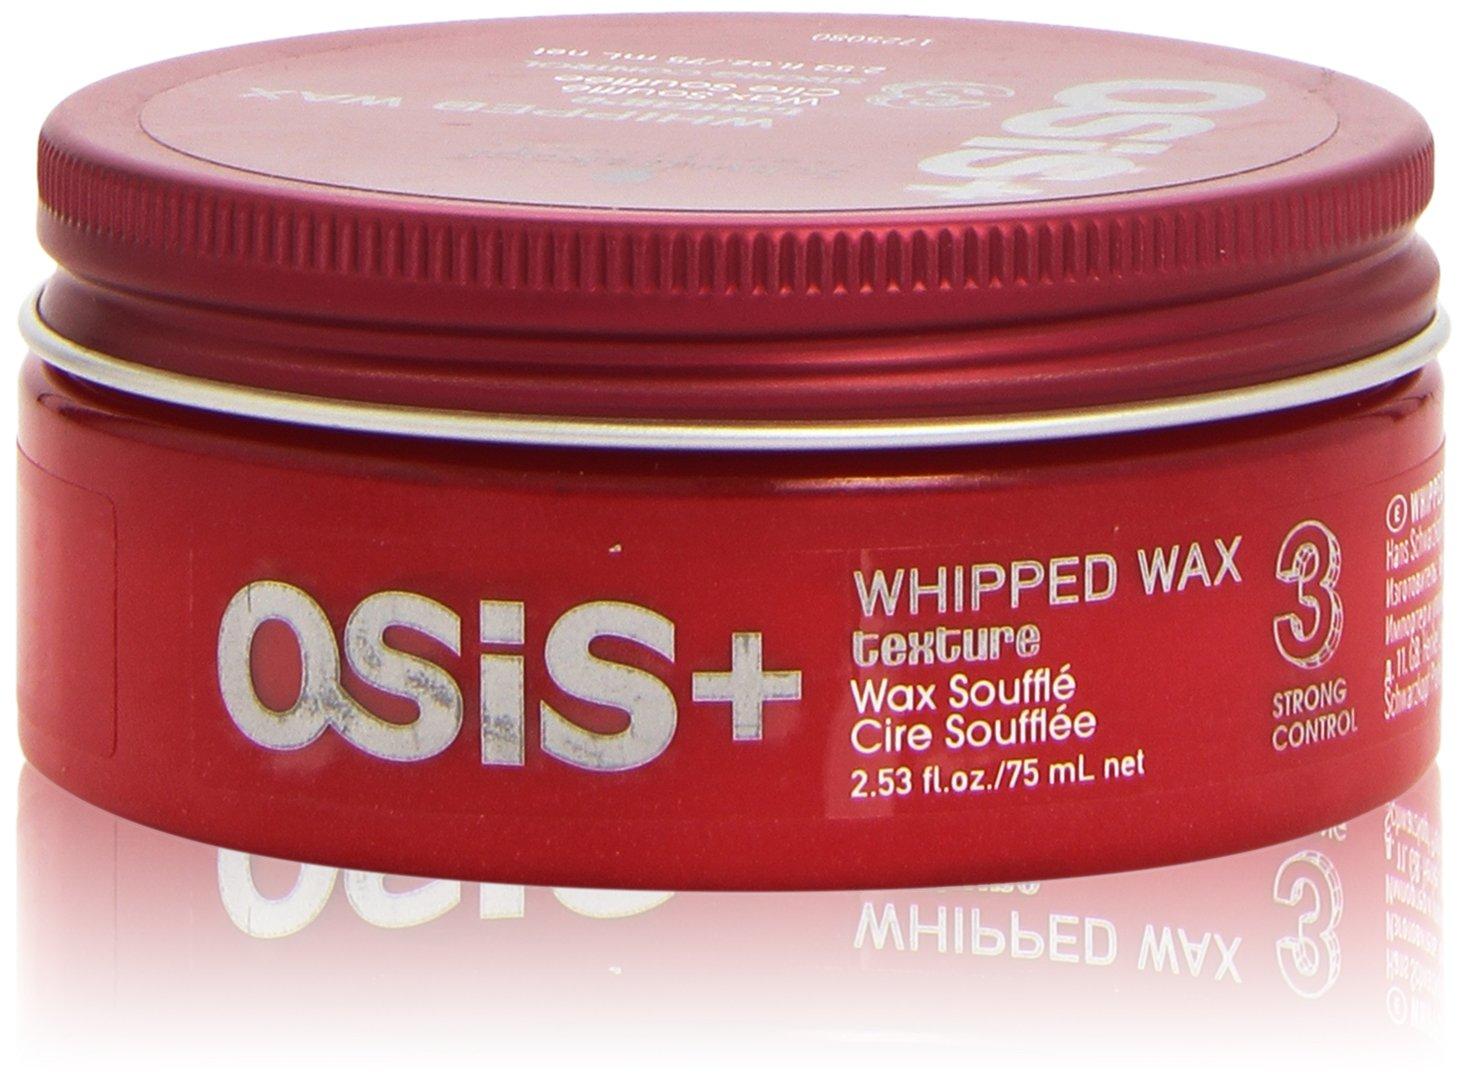 Schwarzkopf Professional OSiS+ Whipped Wax Texture Souffle 2.53 oz / 75 ml